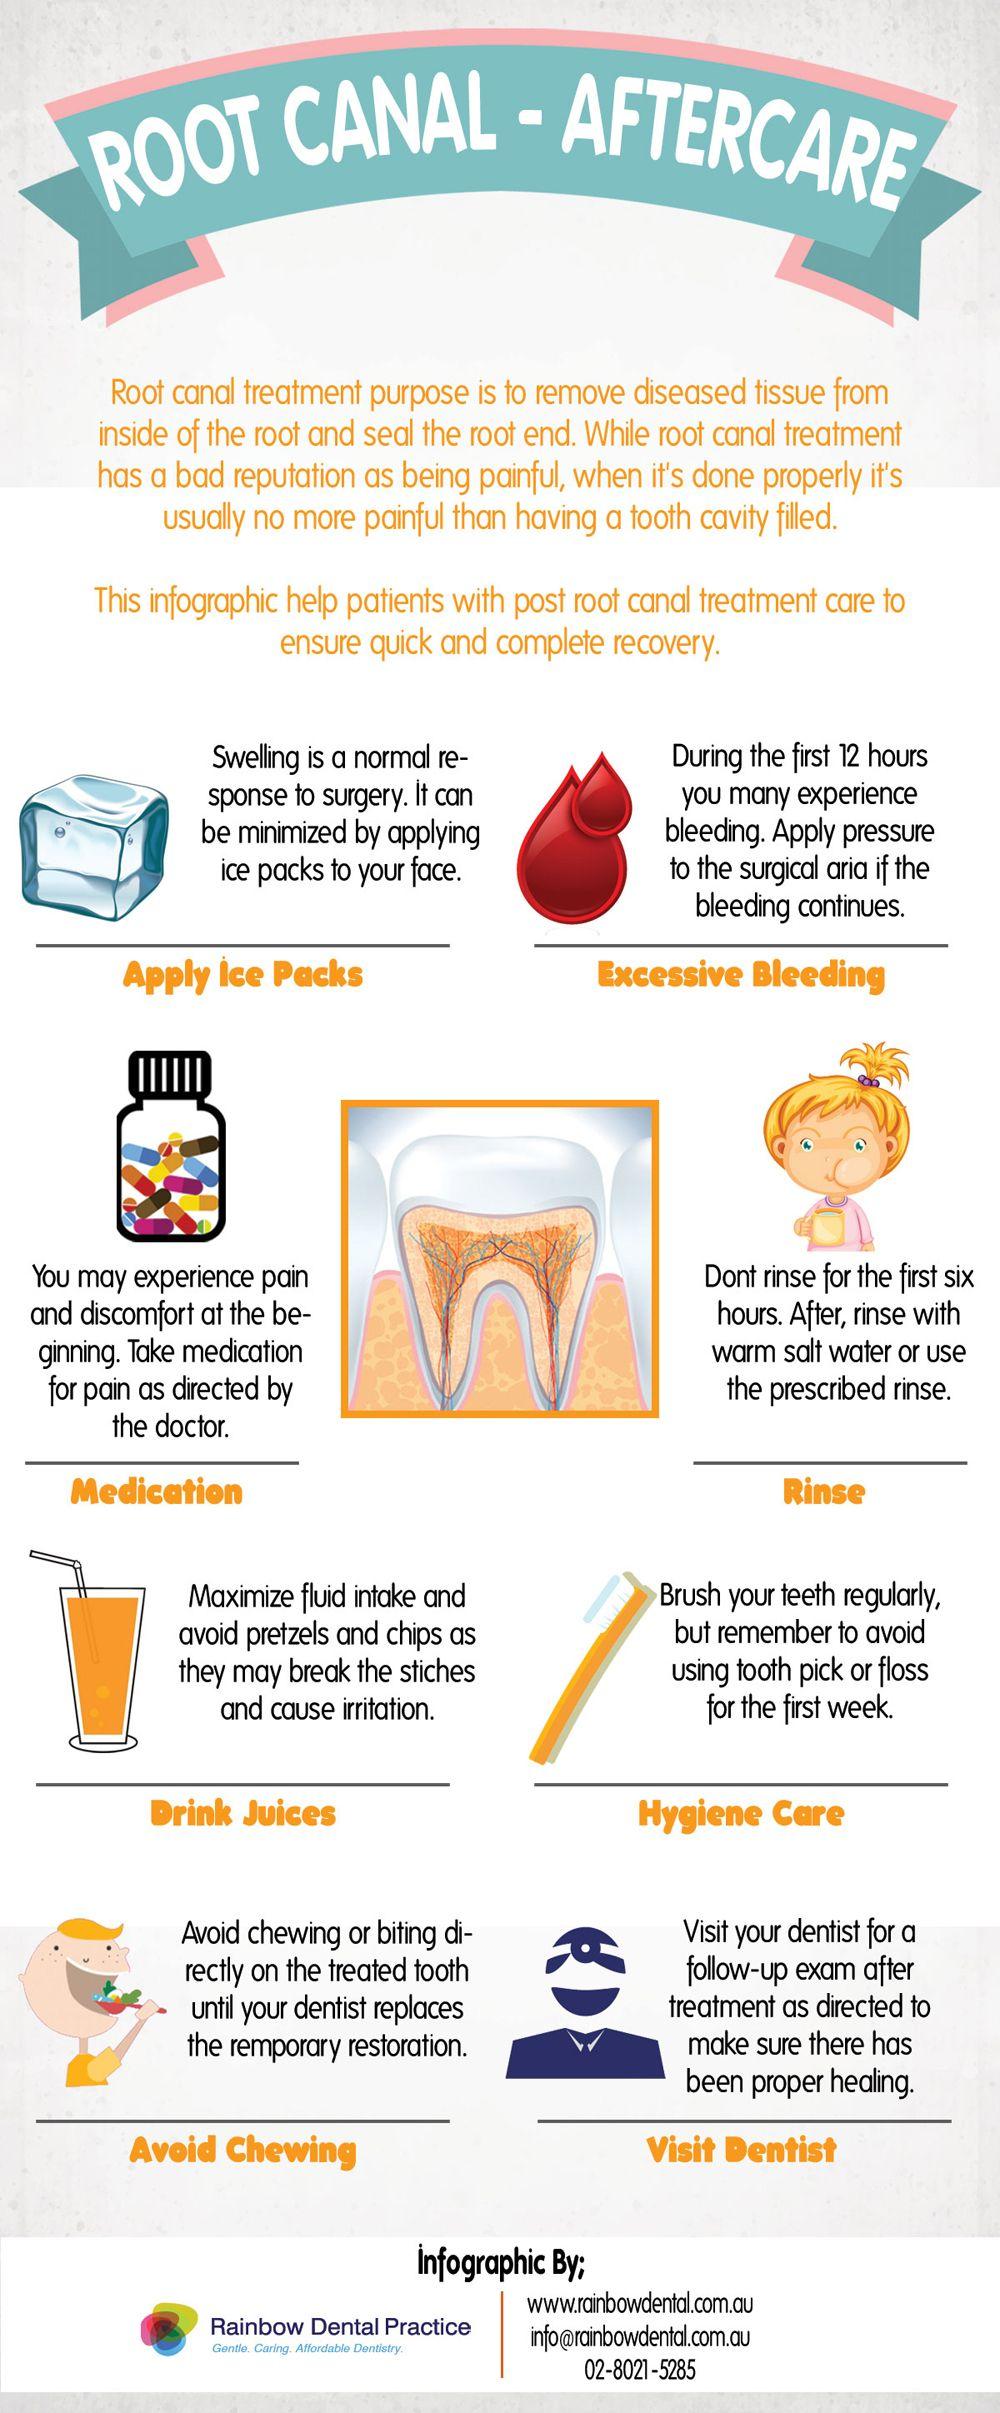 RootCanal Aftercare Infographic dental Dental, Dental